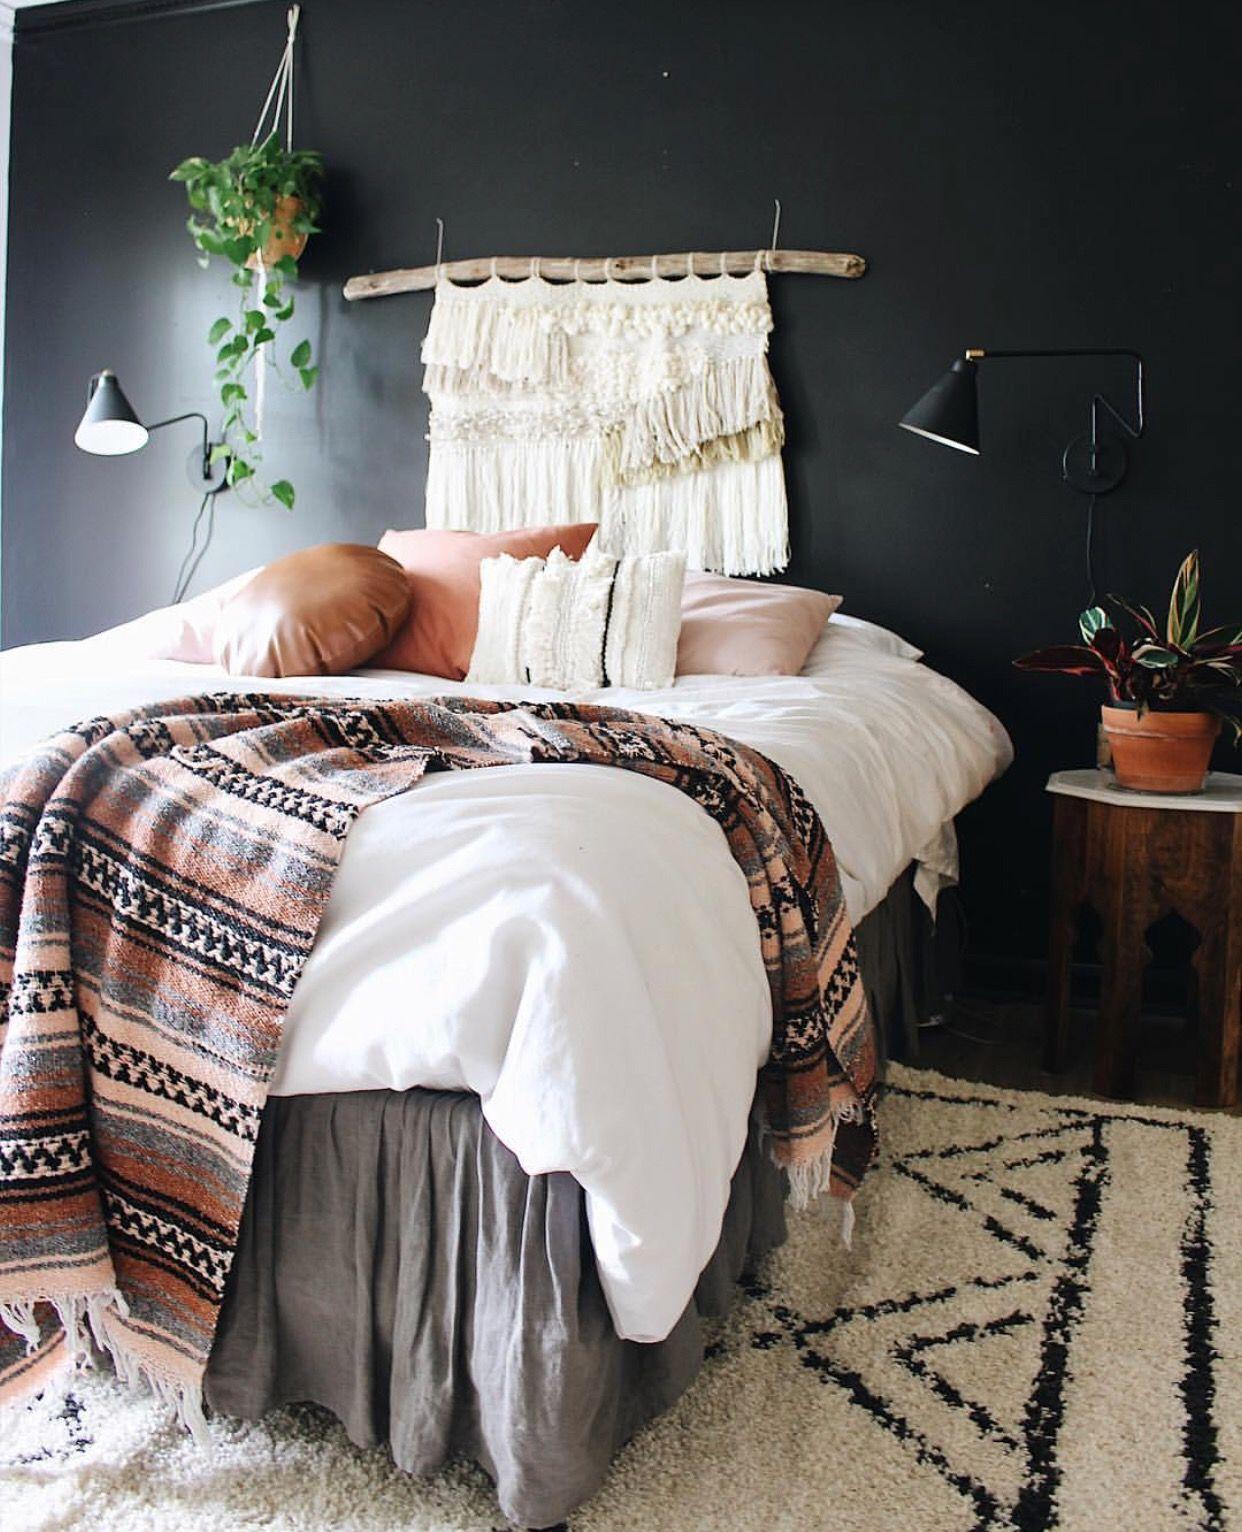 Bohemian Style Bedroom Boho Decor In Bedroom Includes Aztec